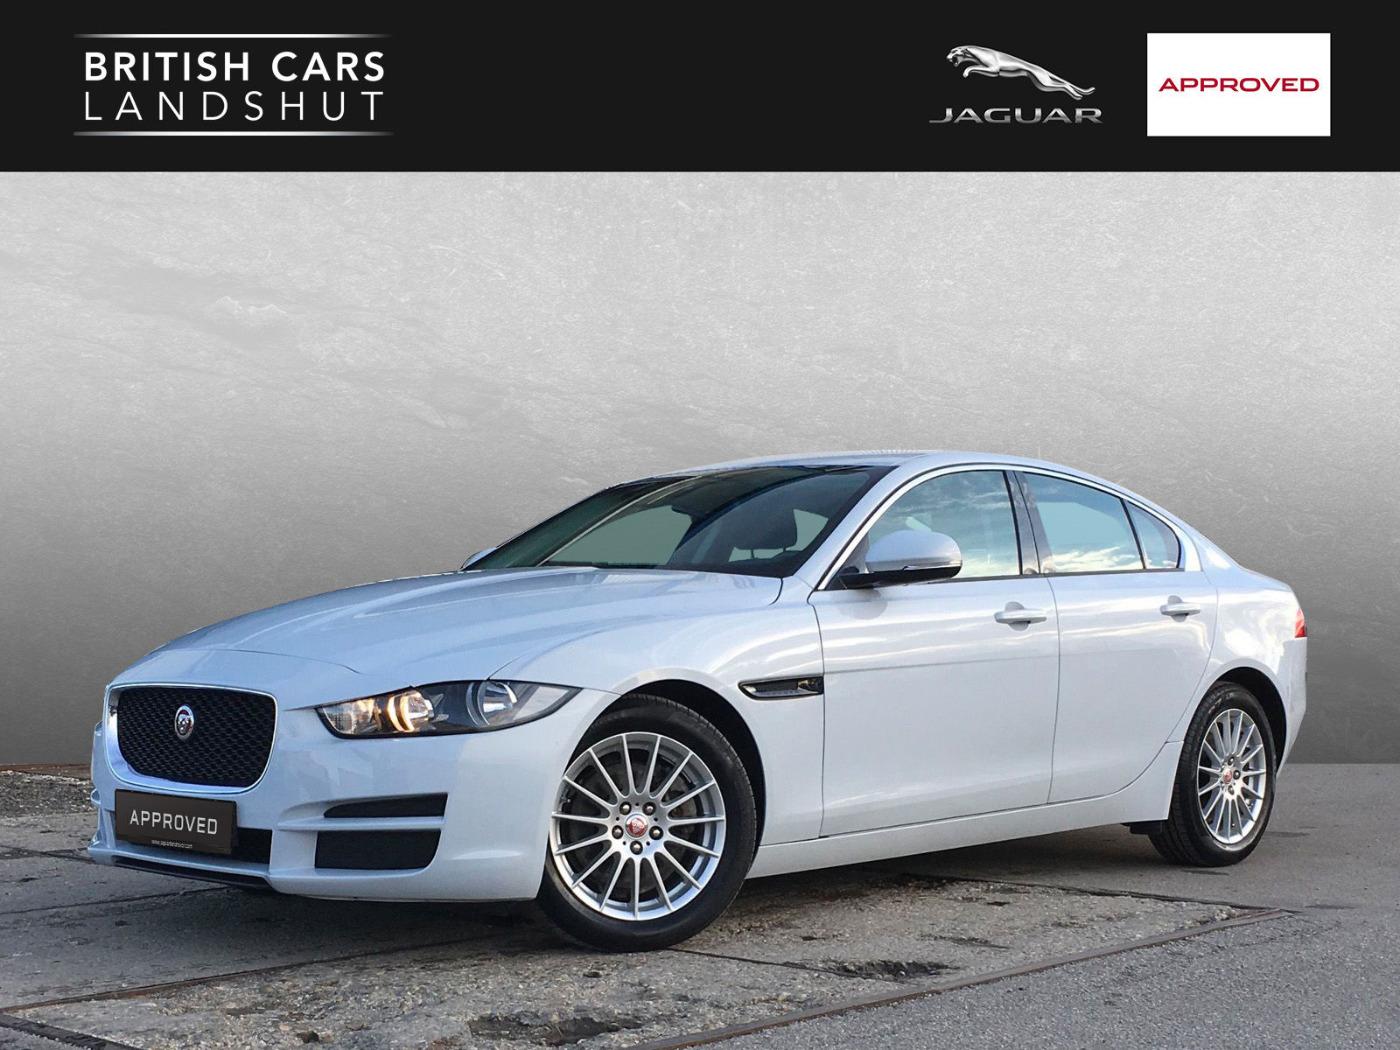 Jaguar XE E-Performance/Navi/beh.Lenkrad/el.Sitze..., Jahr 2015, diesel